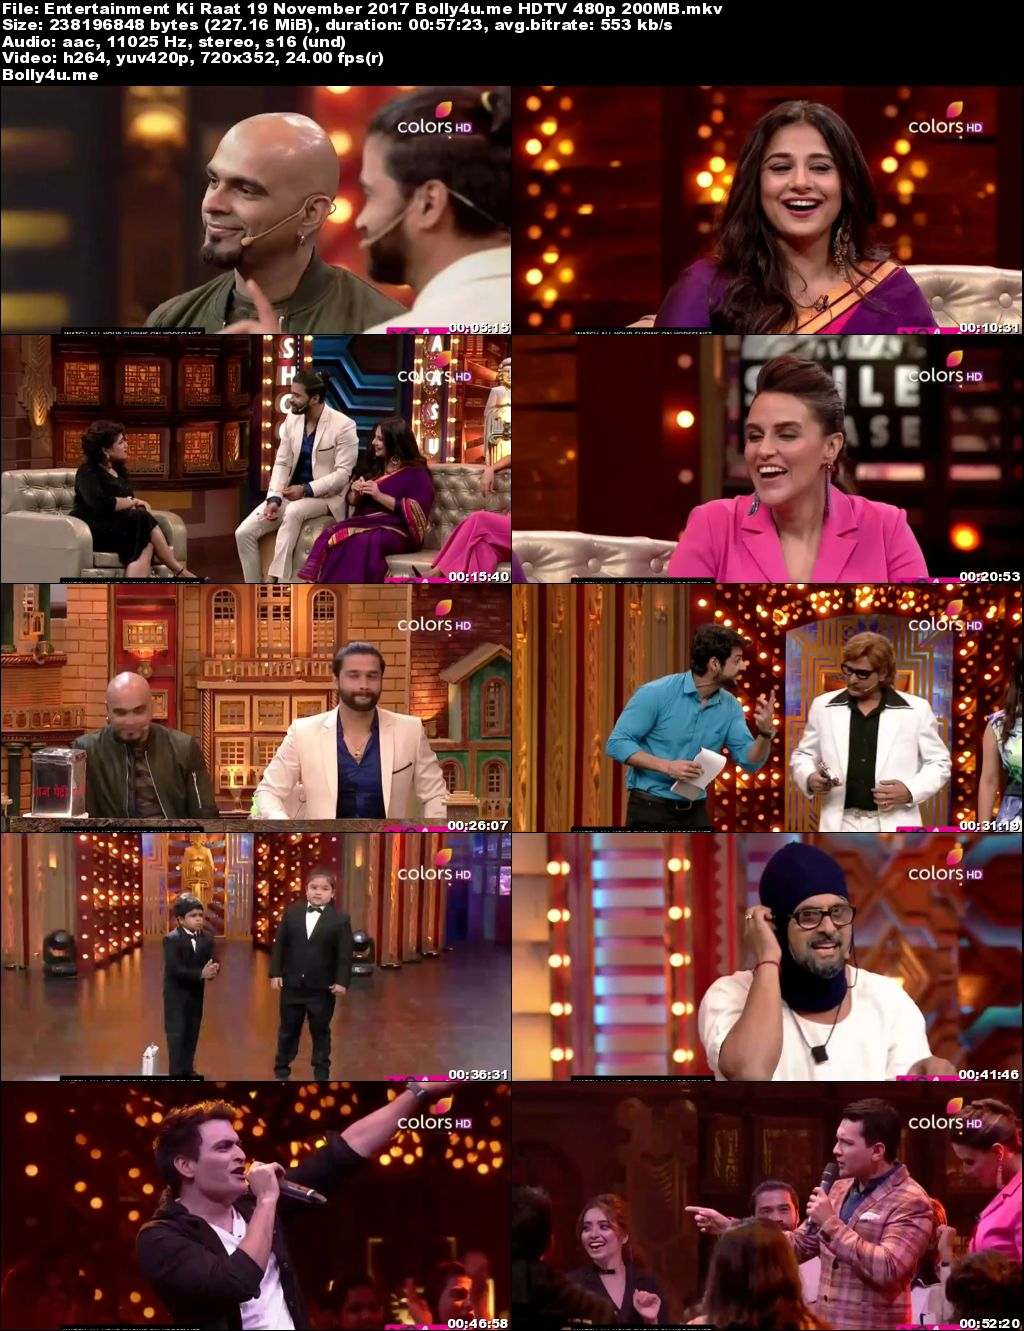 Entertainment Ki Raat HDTV 480p 200MB 19 November 2017 Download